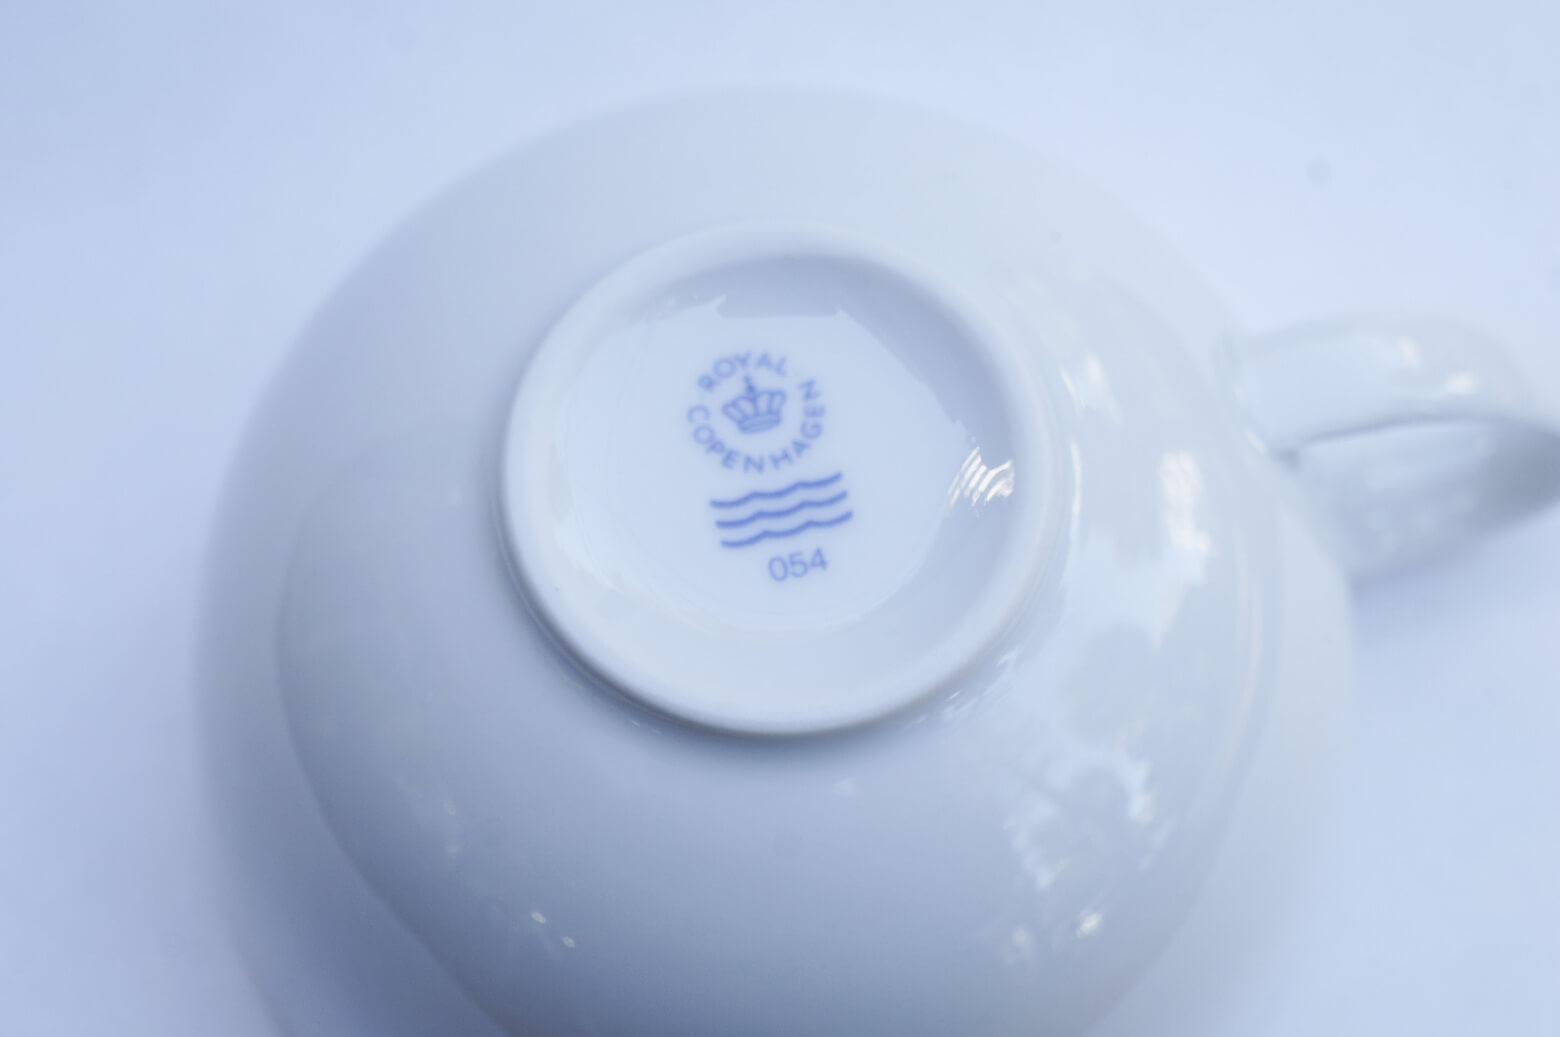 Royal Copenhagen WHITE POT Series/ロイヤル コペンハーゲン ホワイト ポット シリーズ カップ&ソーサー 北欧 食器 8